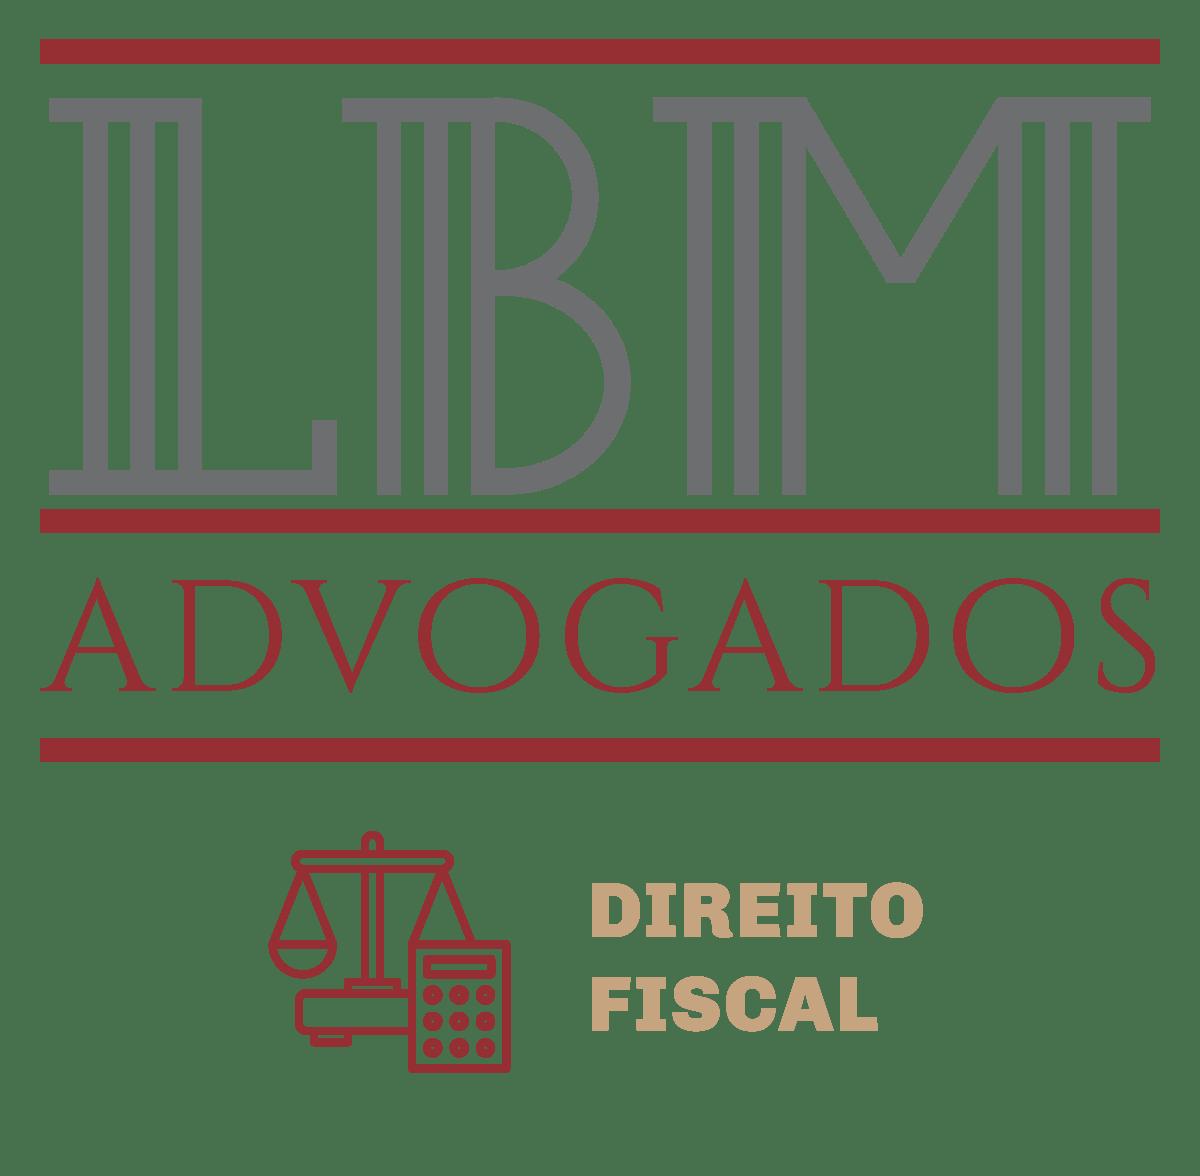 Advogados Direito Fiscal